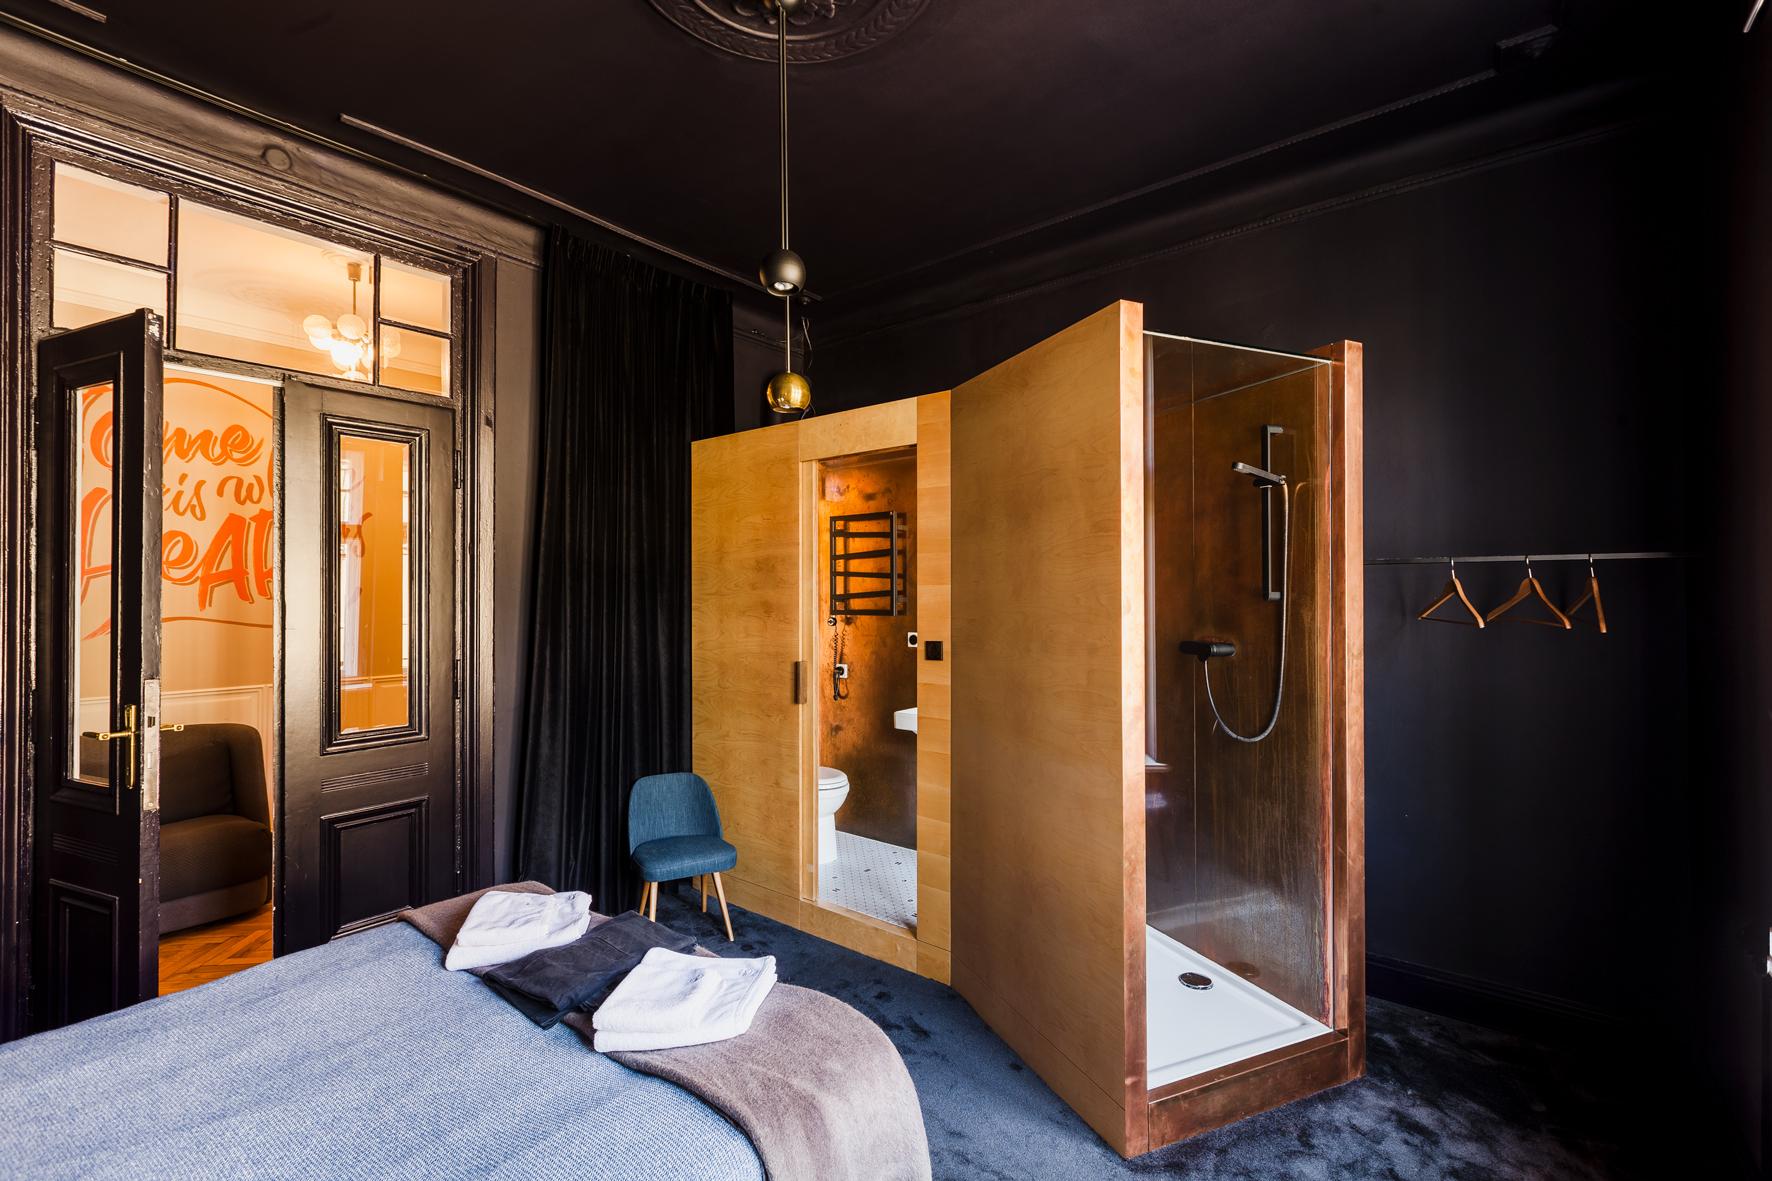 Autor Rooms - Where will I sleep?